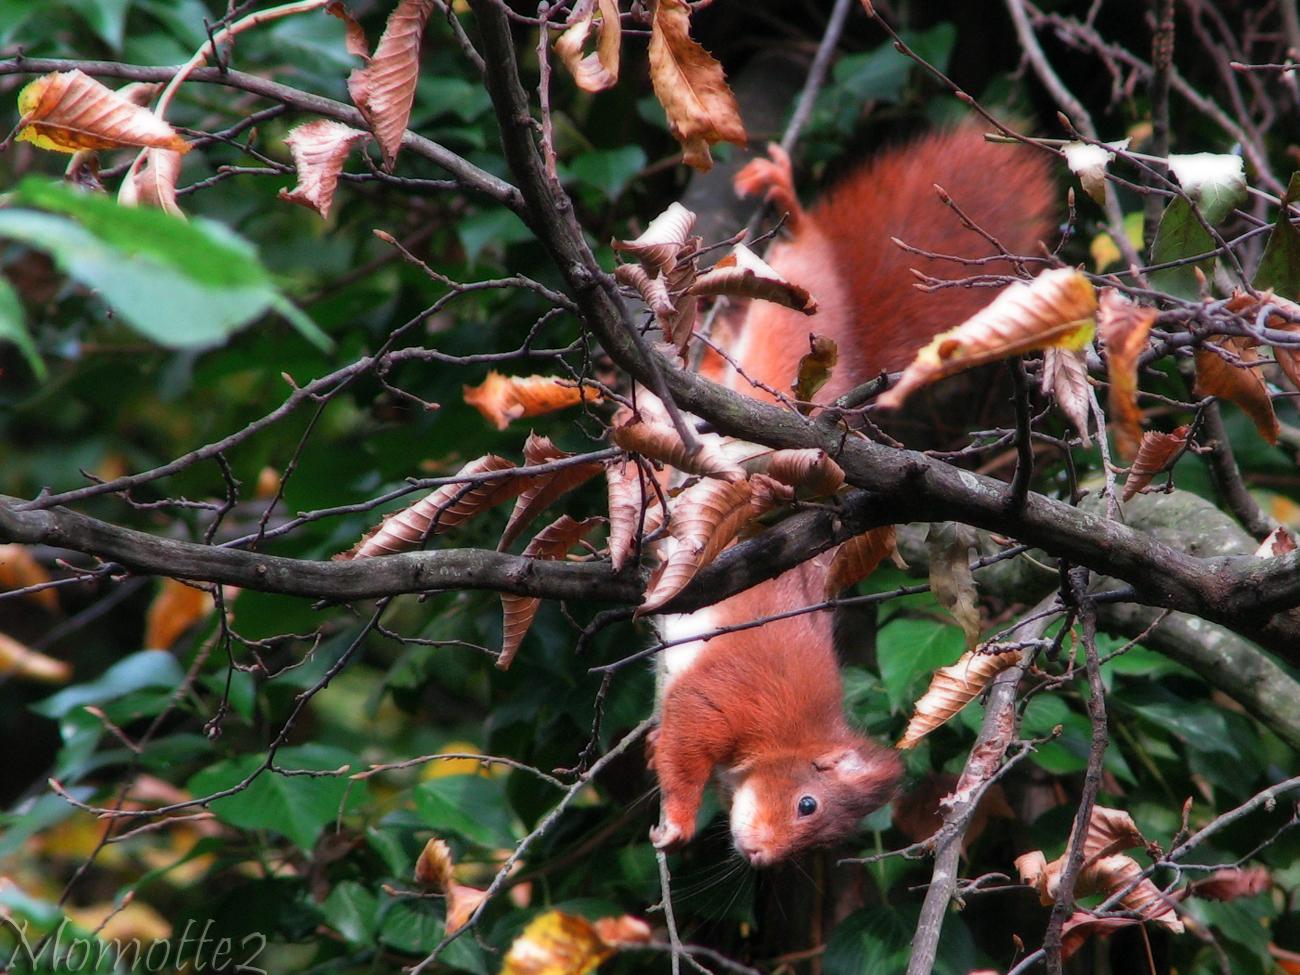 Acrobat squirrel by Momotte2